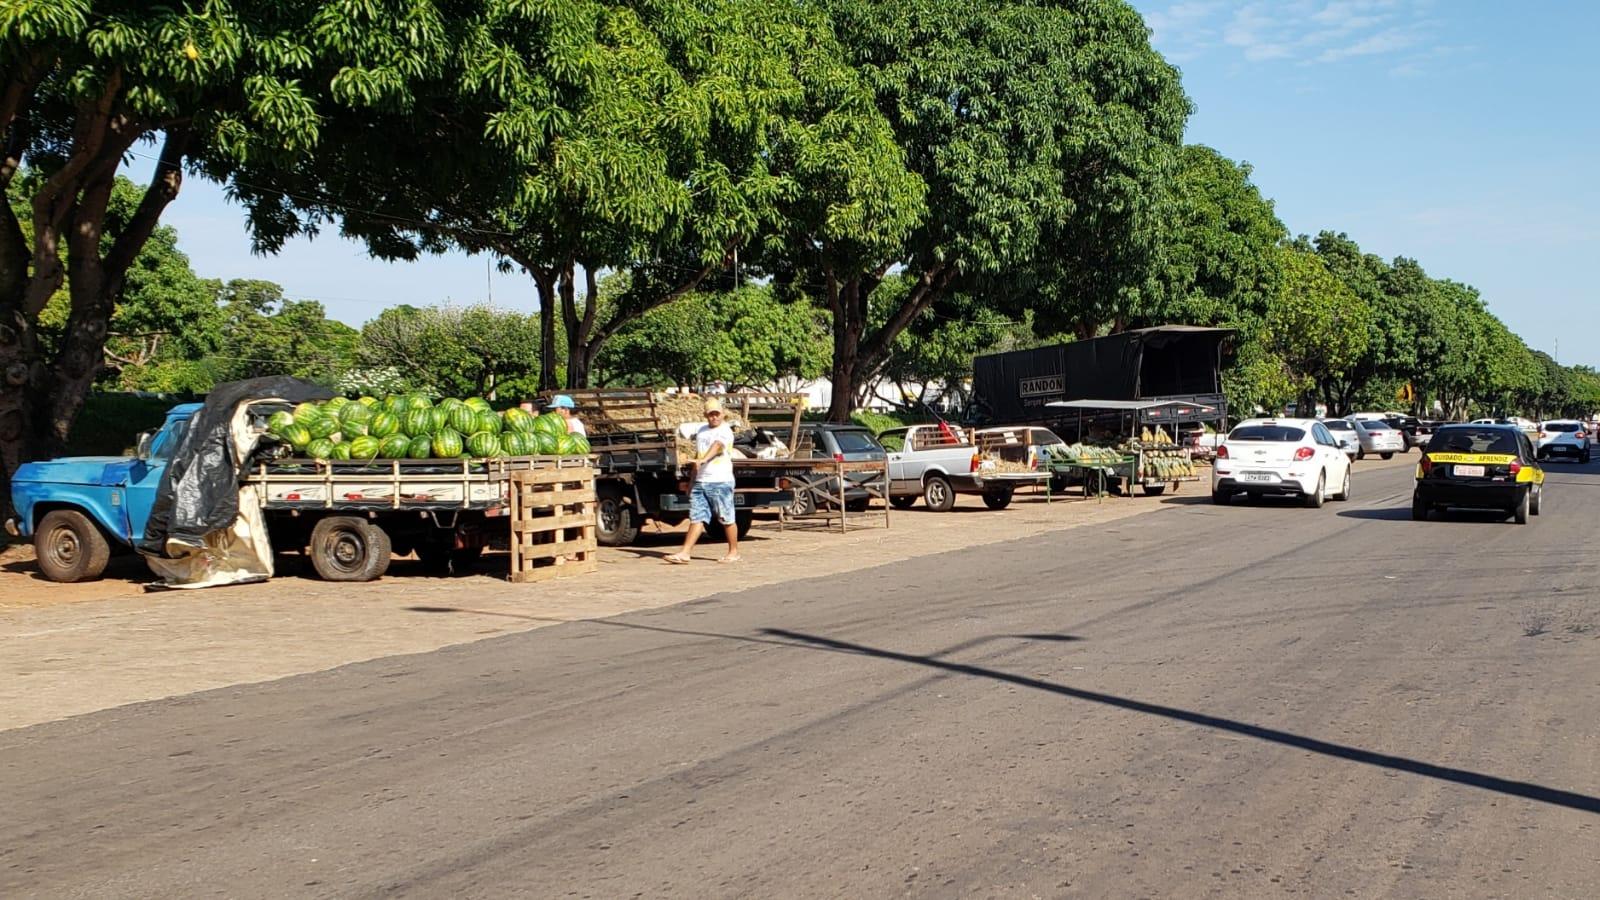 MPE recomenda que vendedores de chambari e ambulantes ocupem local fixo em Guaraí